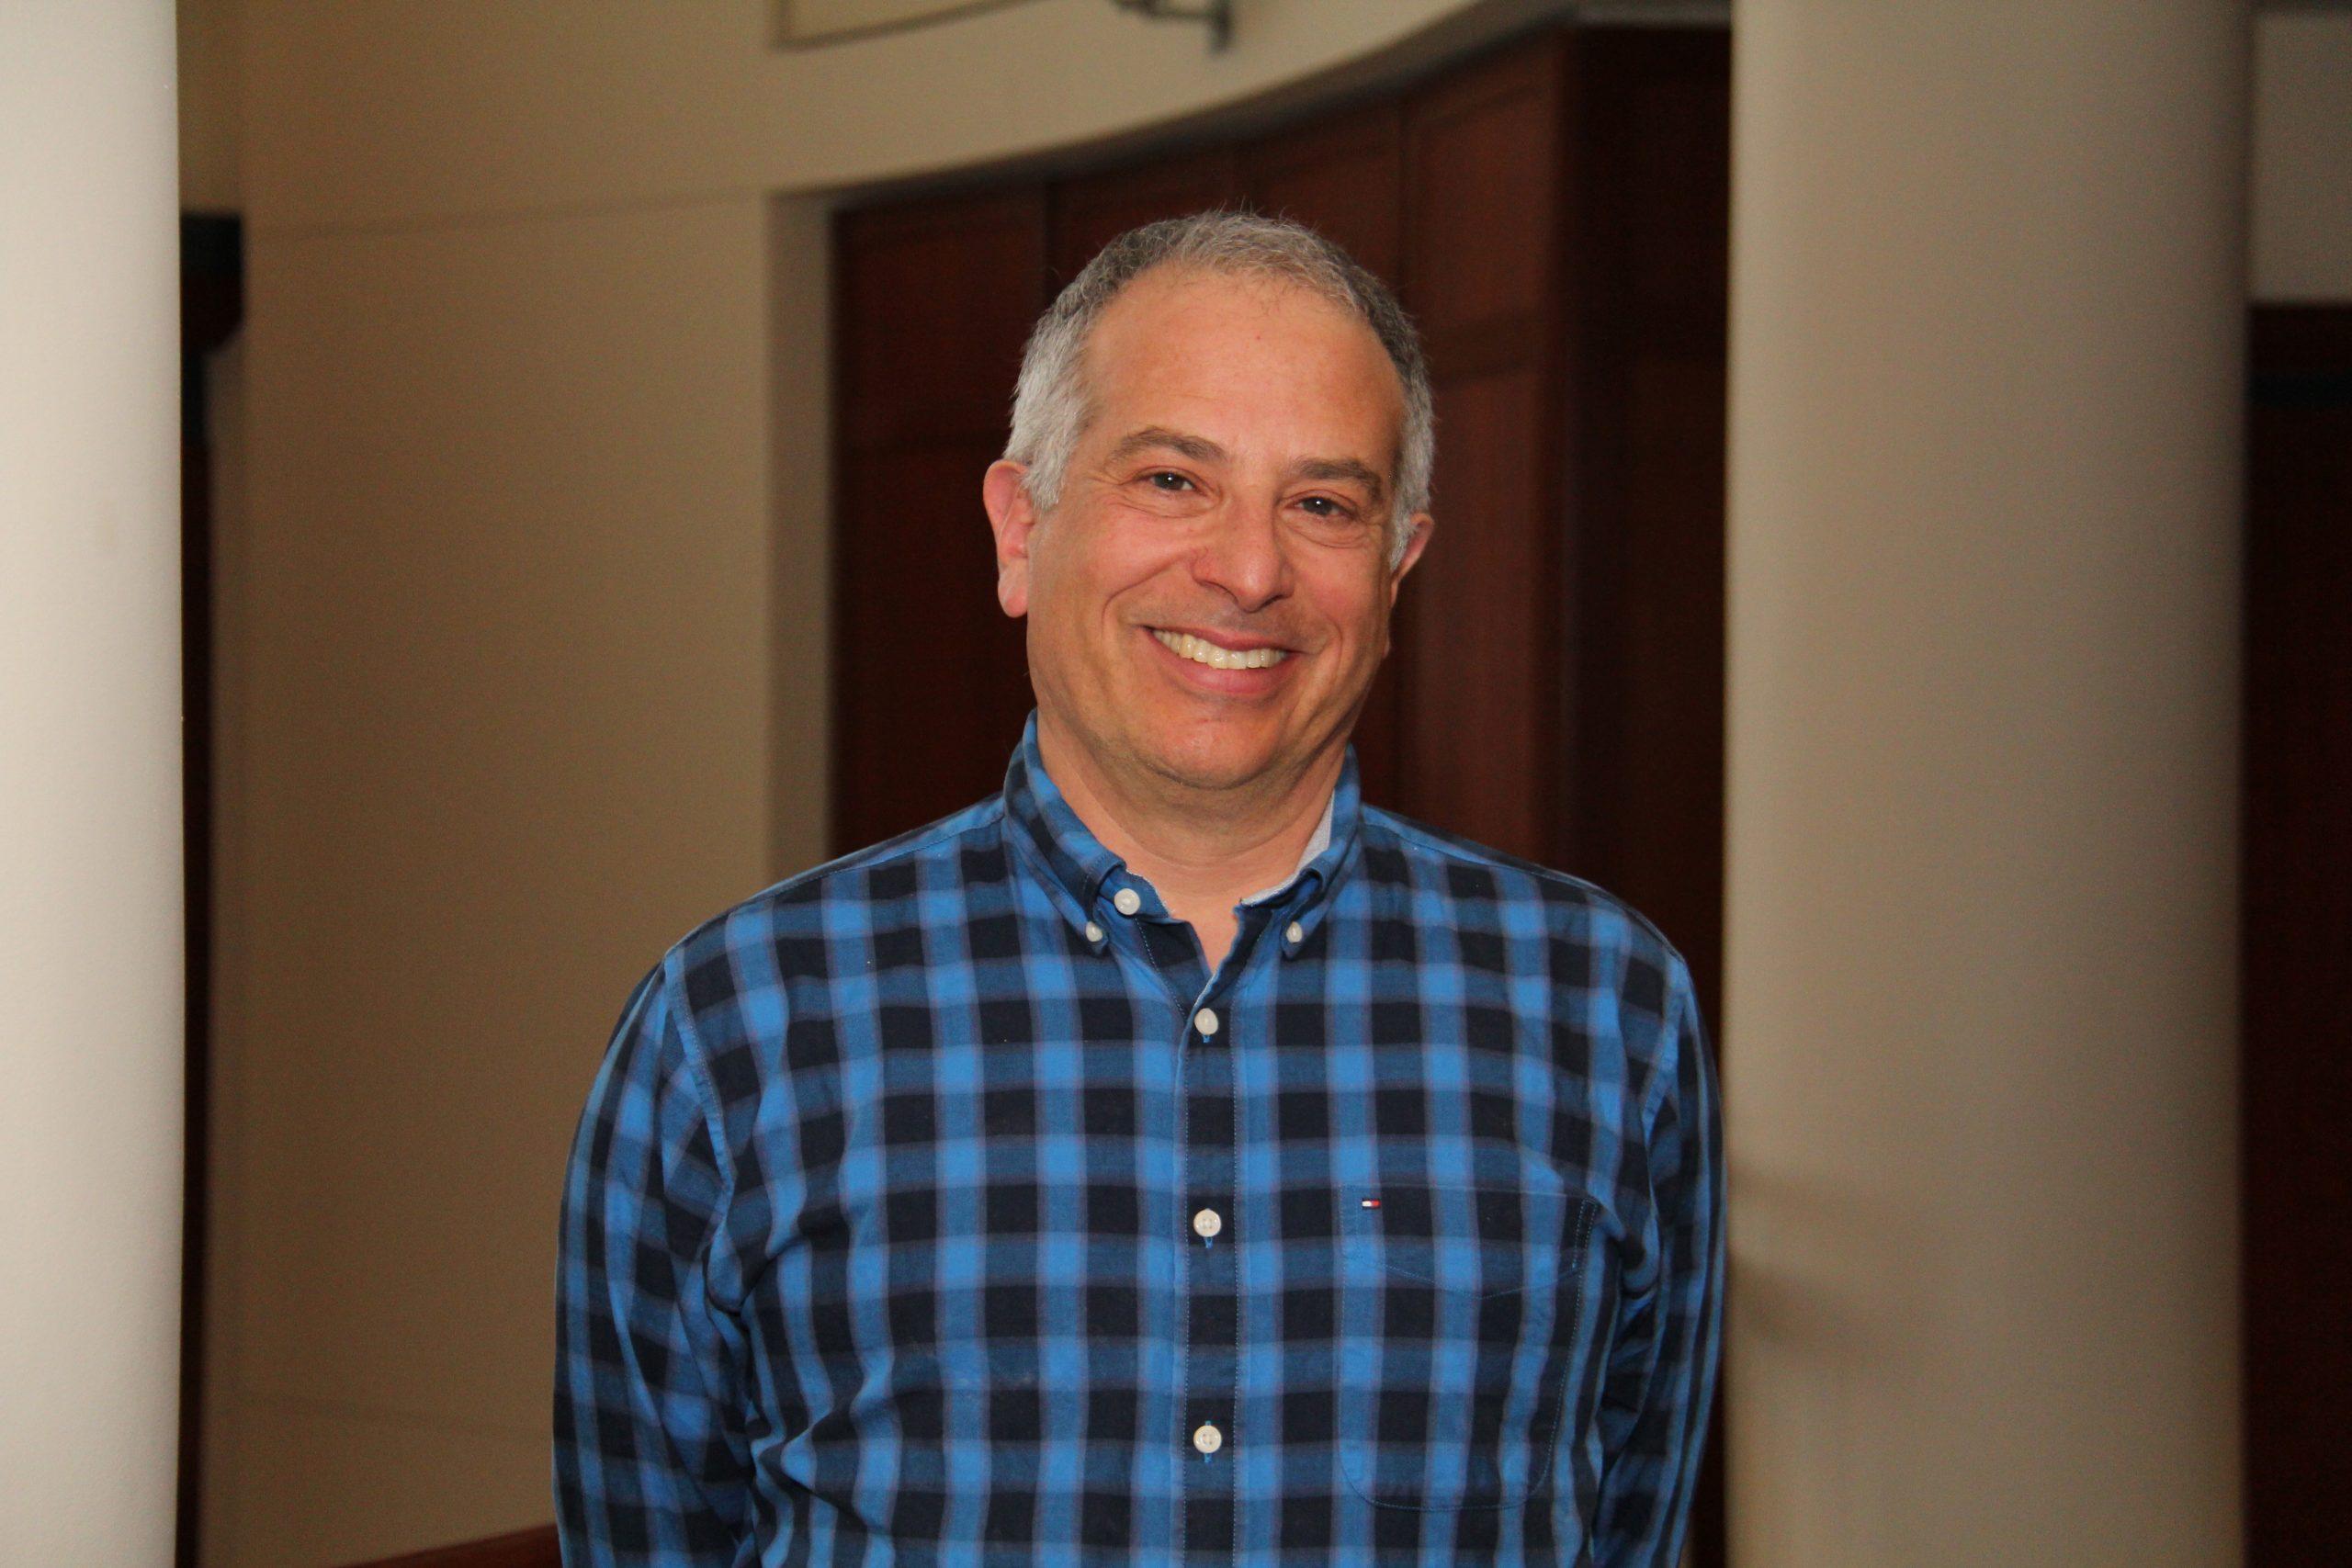 John Avitabile, Saint Rose associate professor of computer science